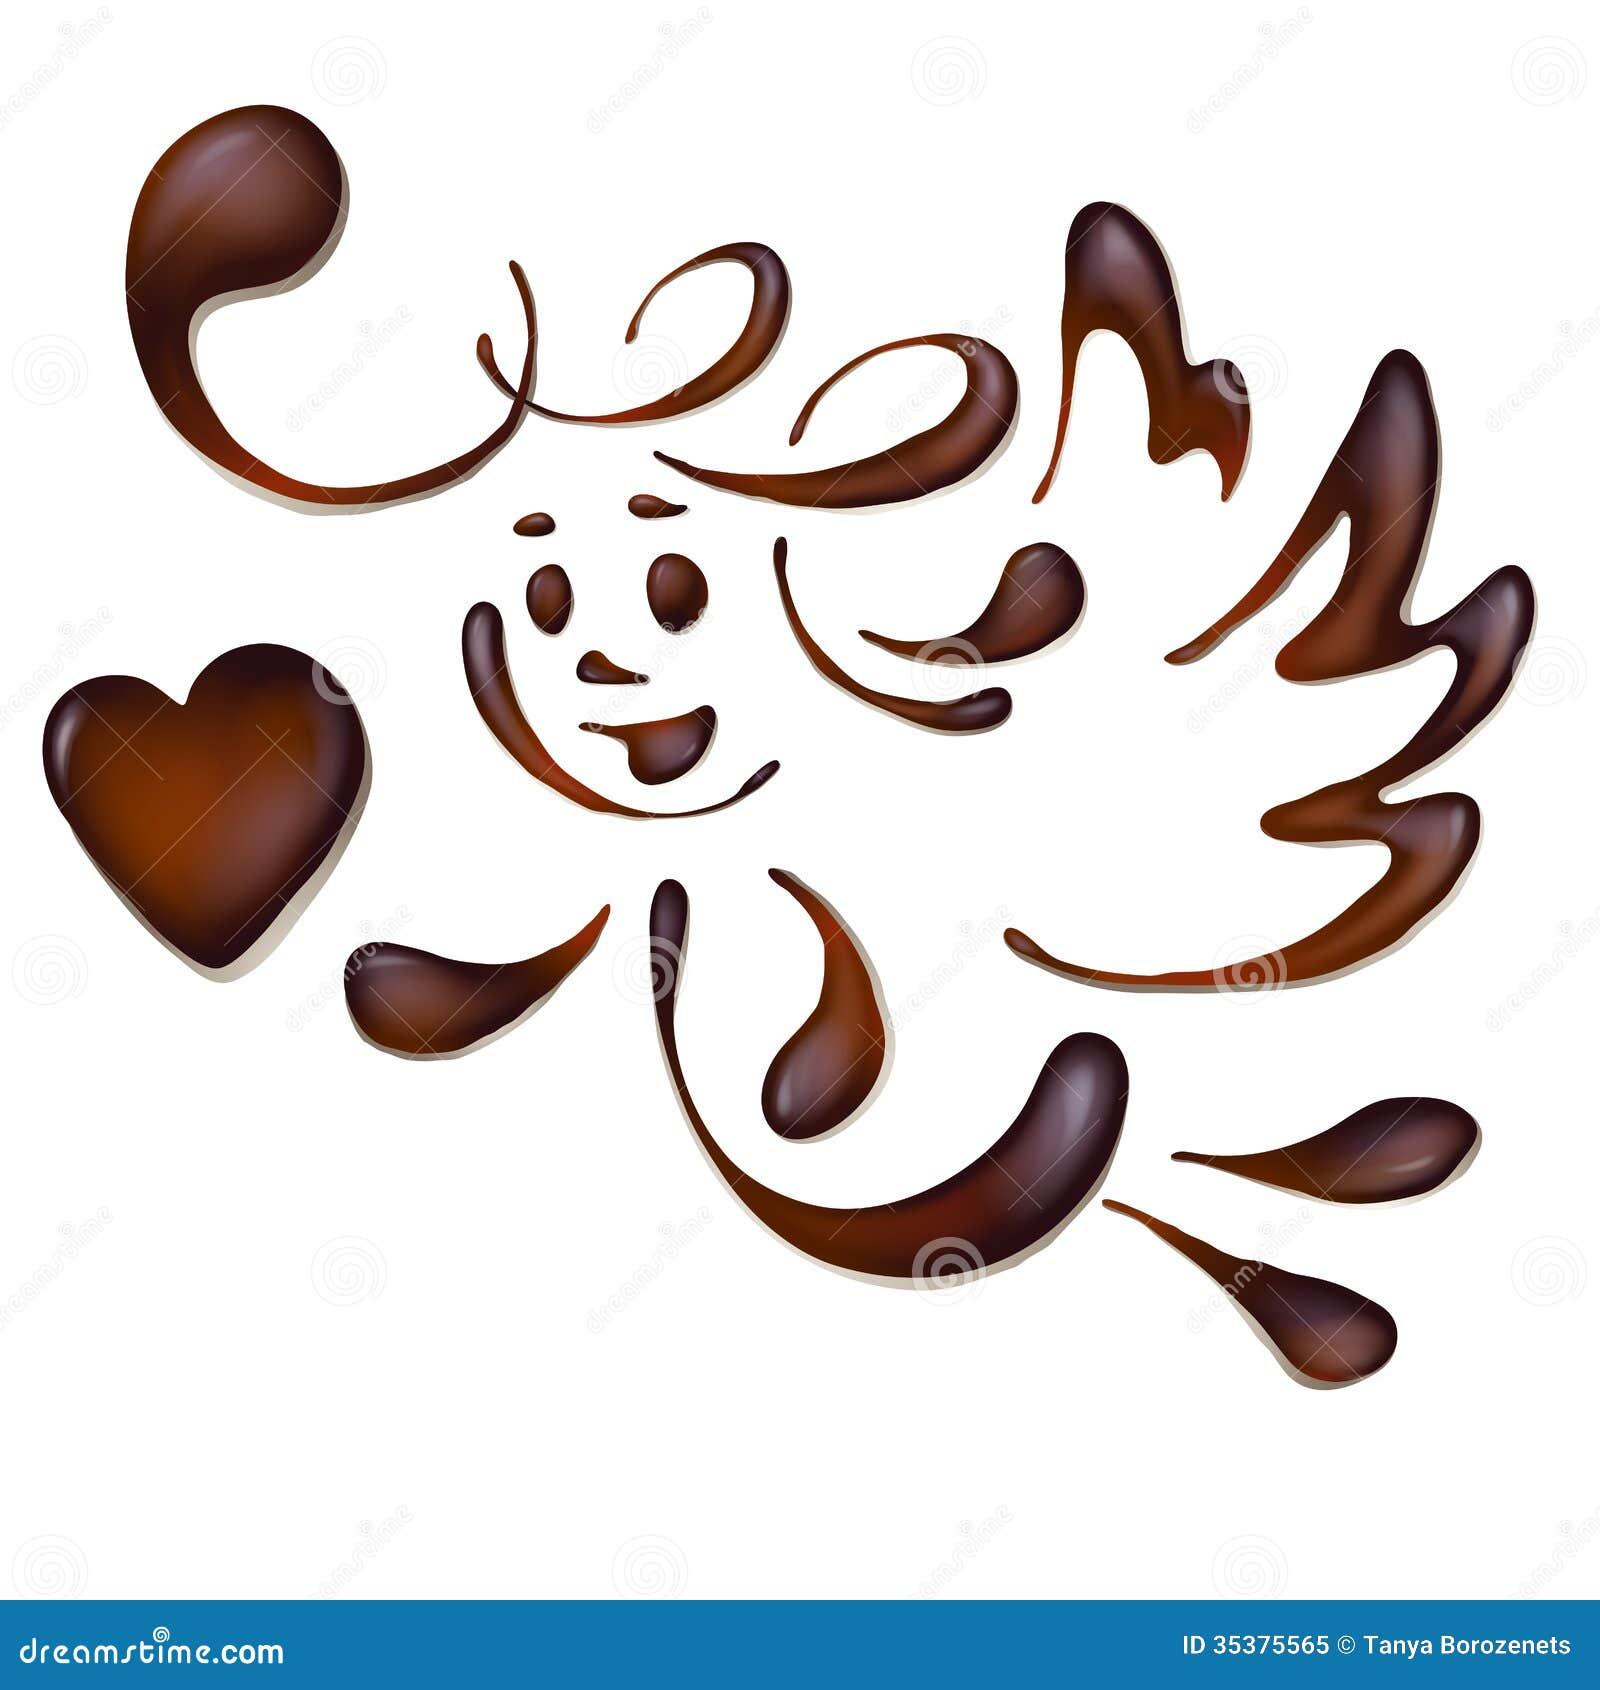 Chocolate Angel Royalty Free Stock Photo - Image: 35375565